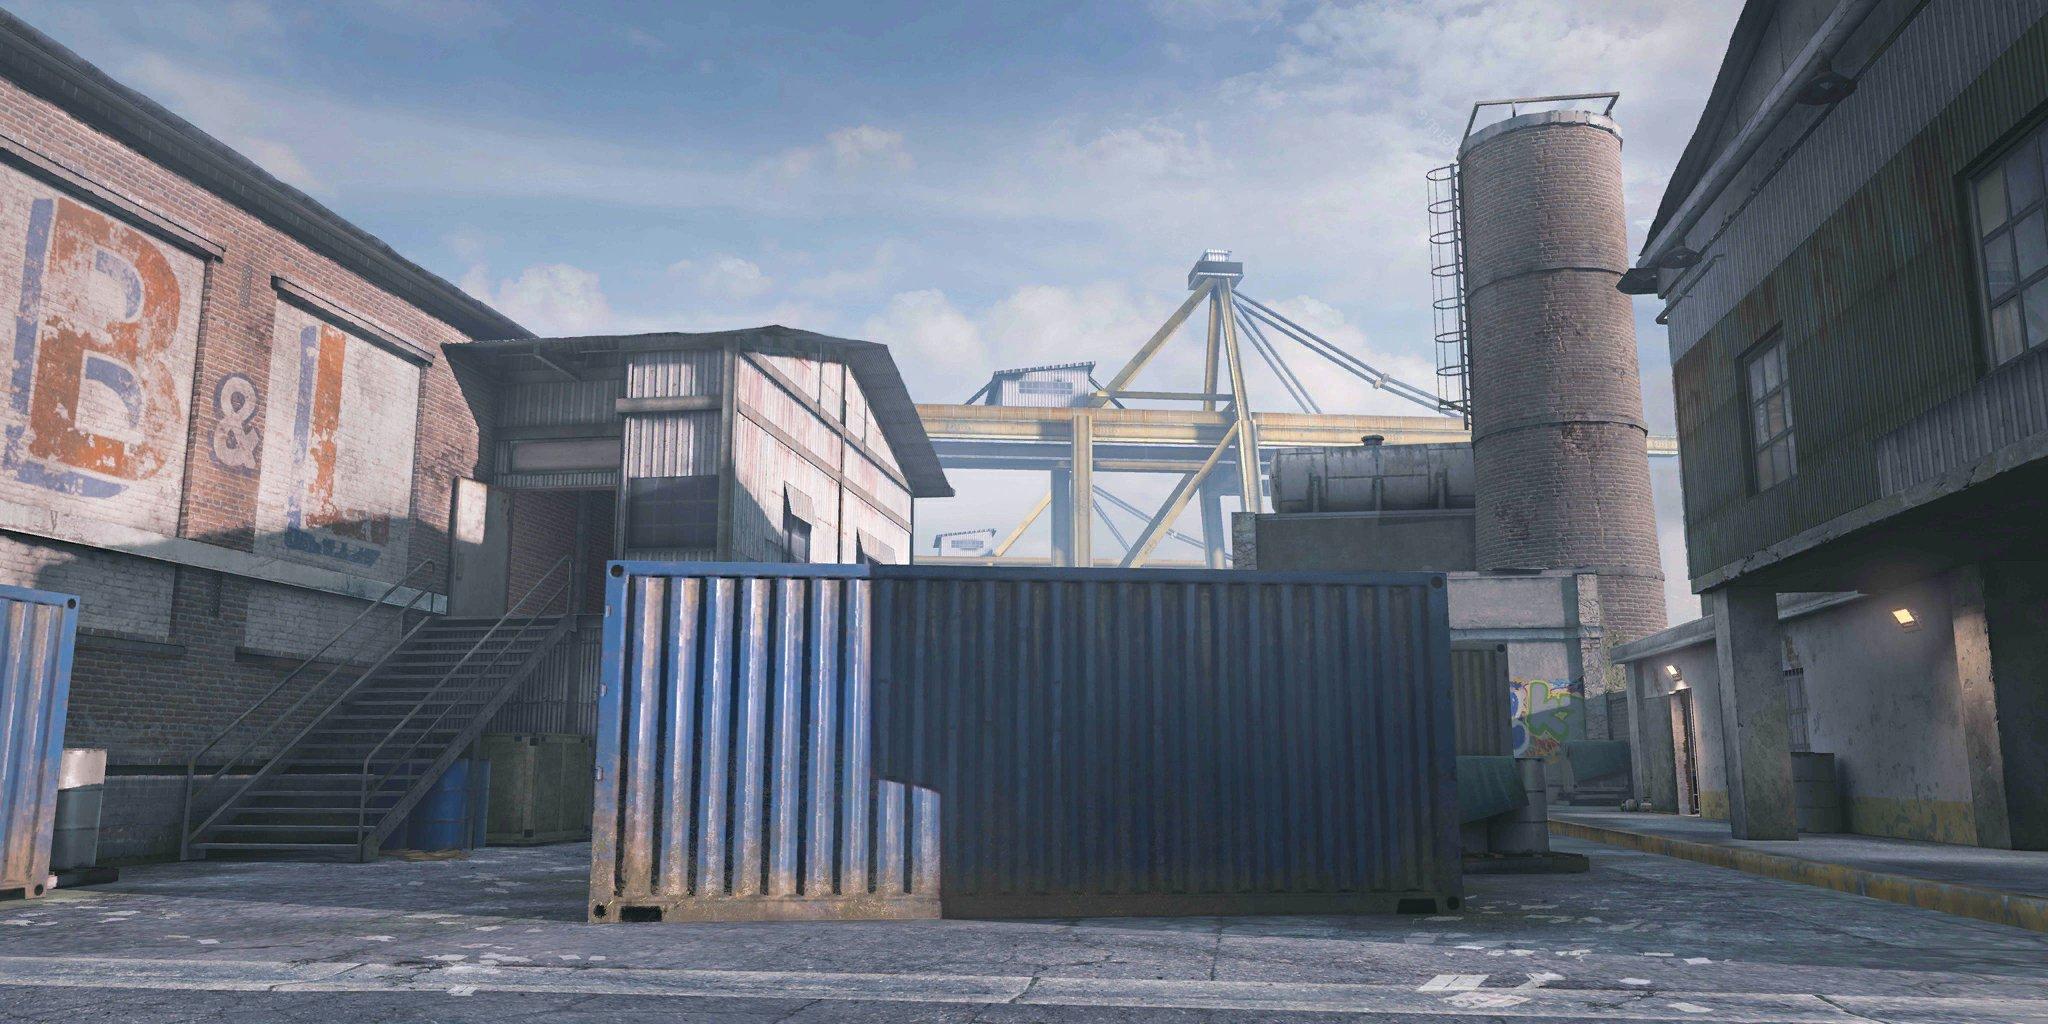 Hackney Yard COD Mobile Season 12